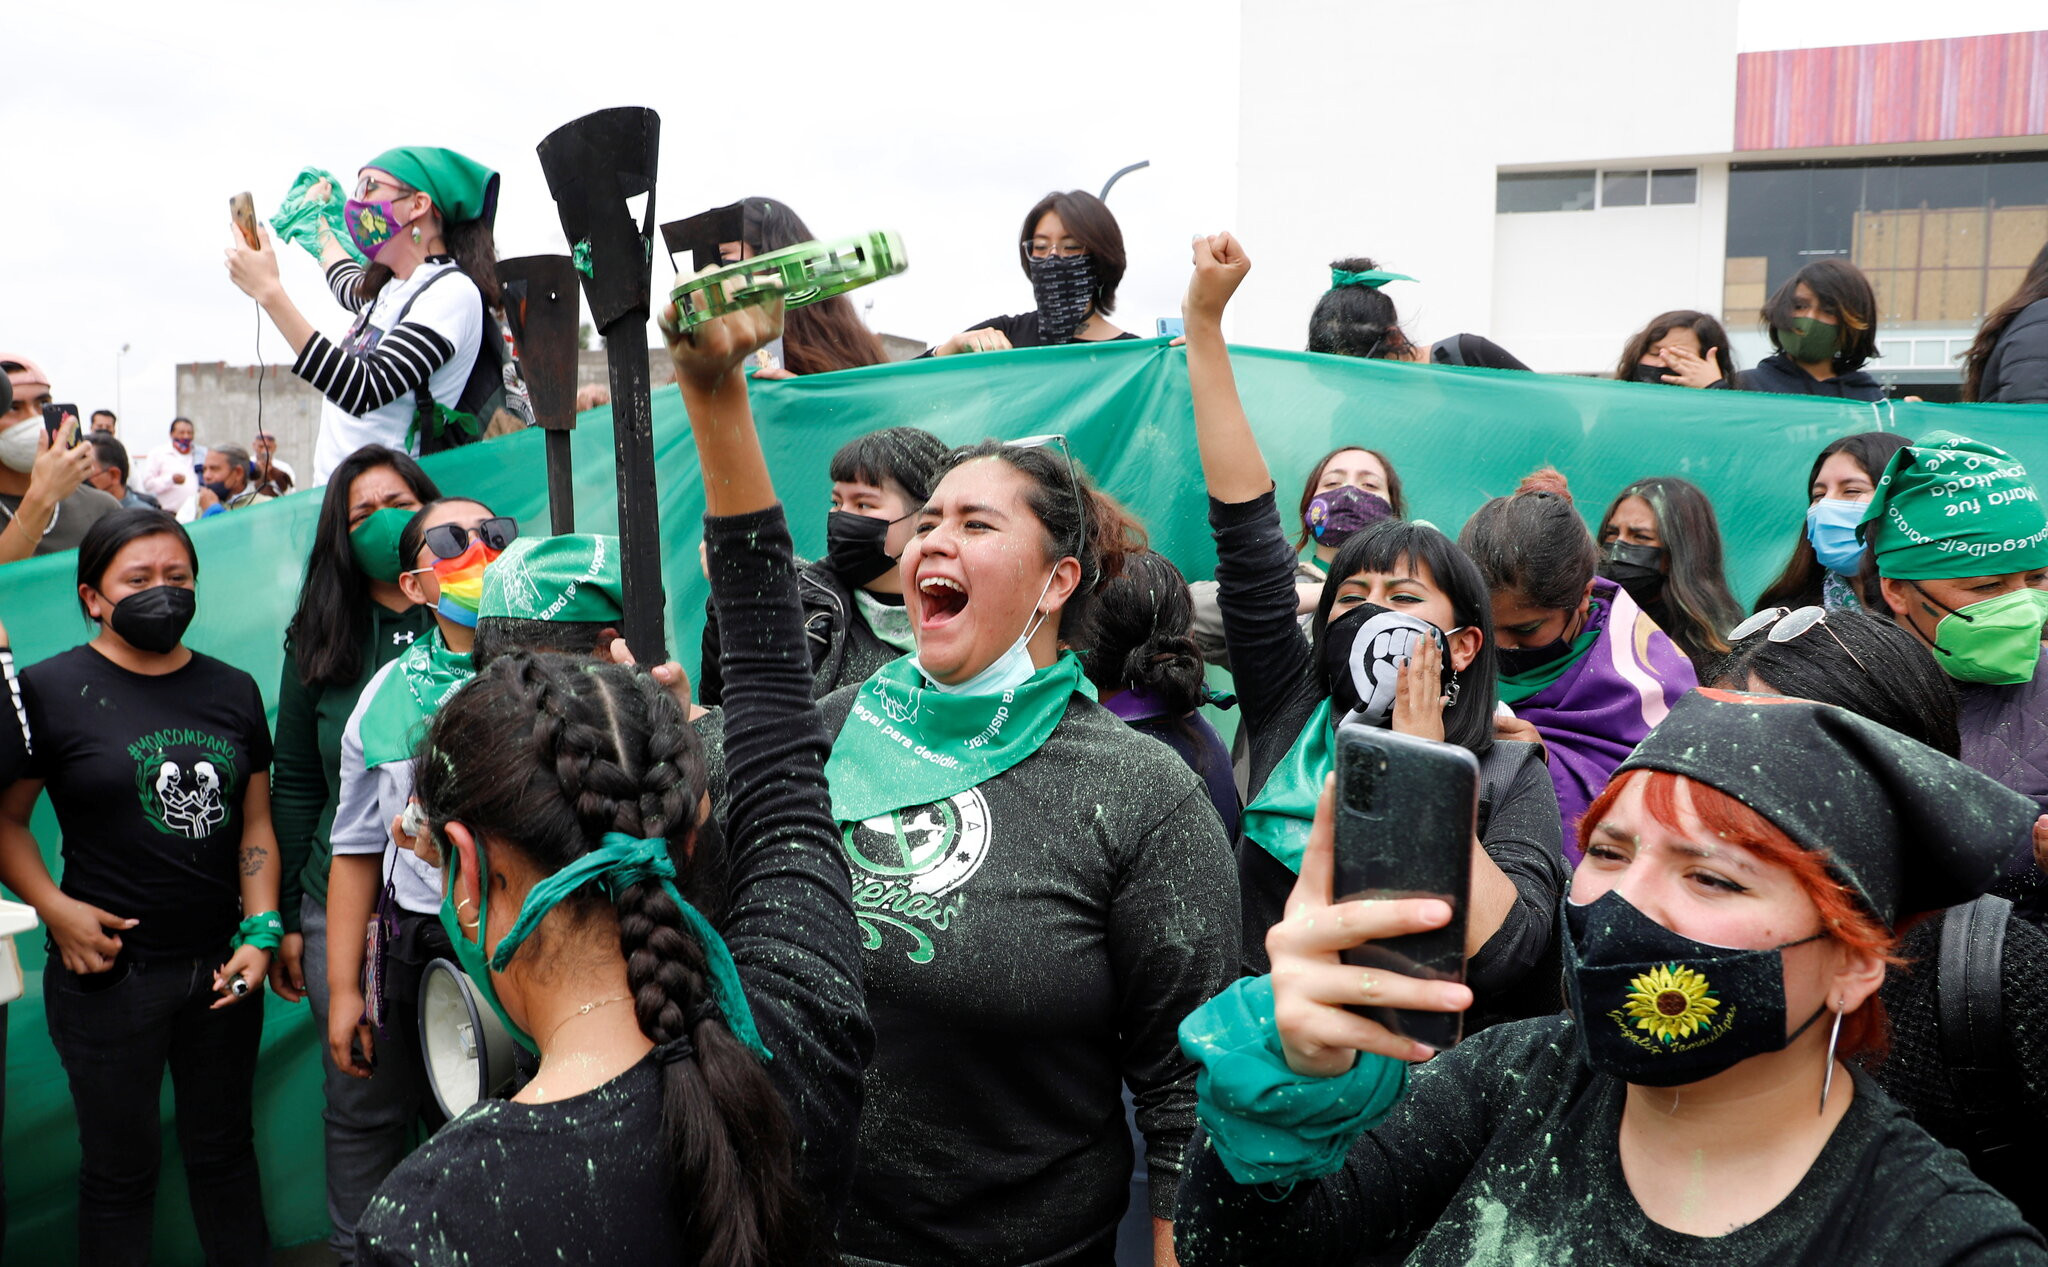 Mexico decriminalises abortion in landmark ruling